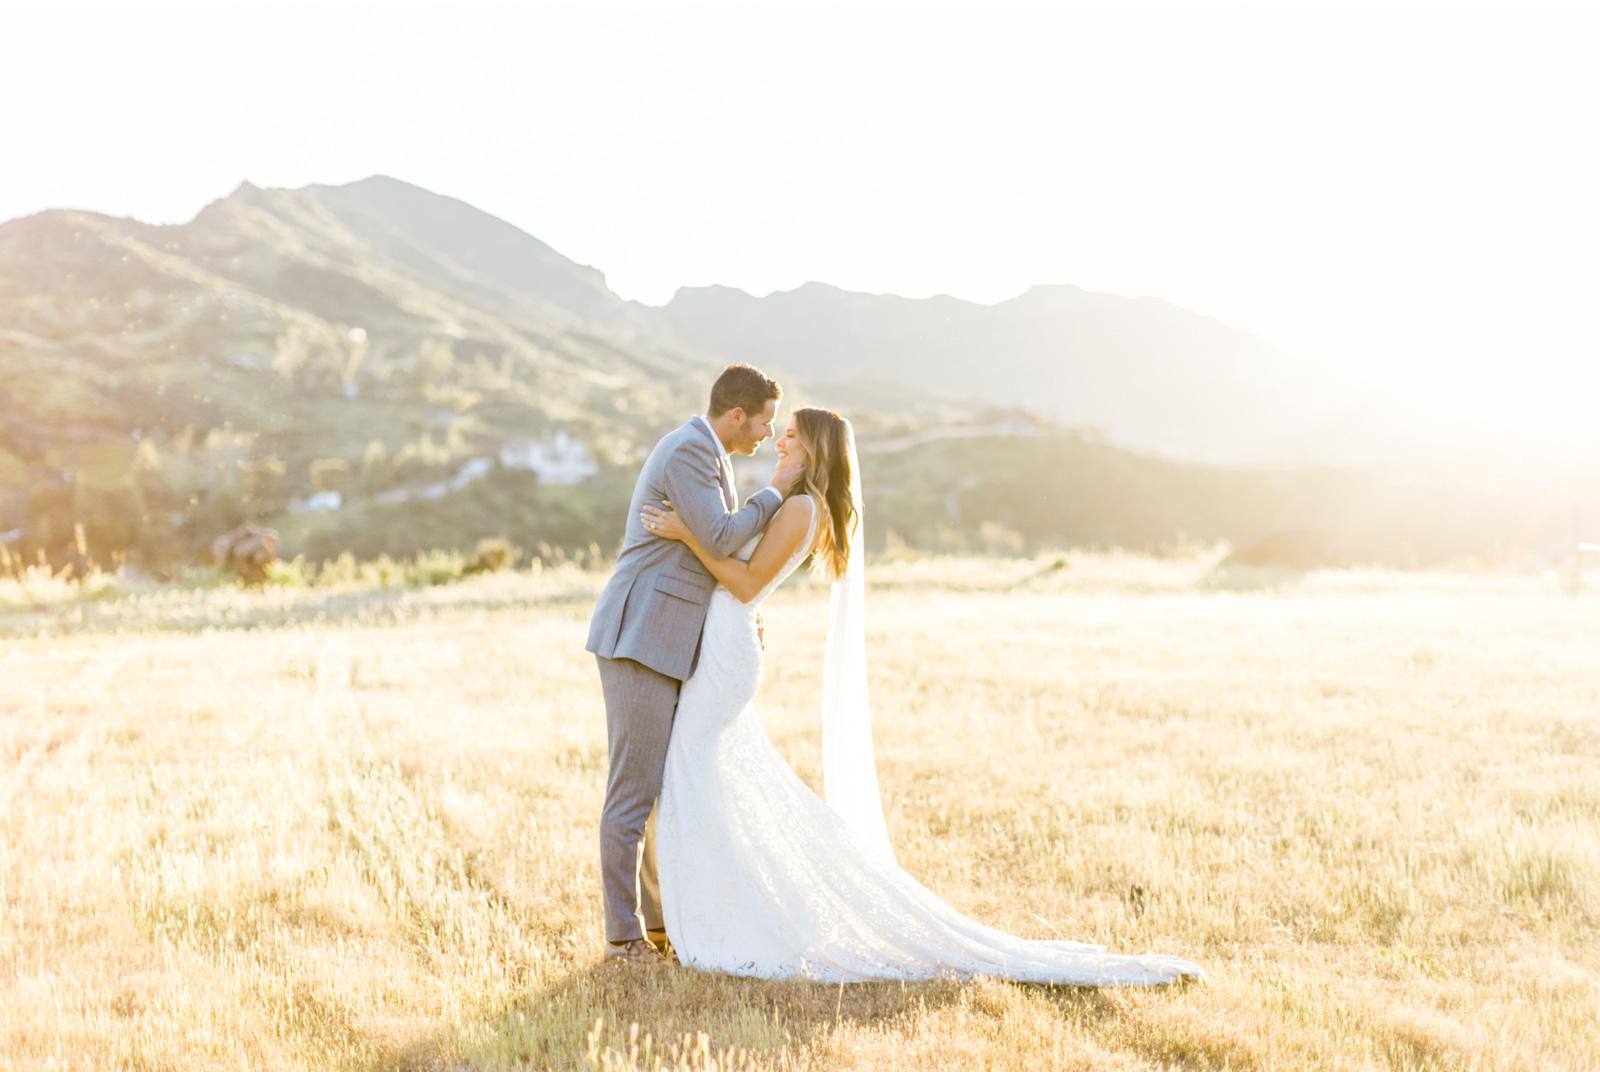 Triunfo-Creek-Malibu-Wedding-Natalie-Schutt-Photography-Couture-Events-Style-Me-Pretty_01.jpg